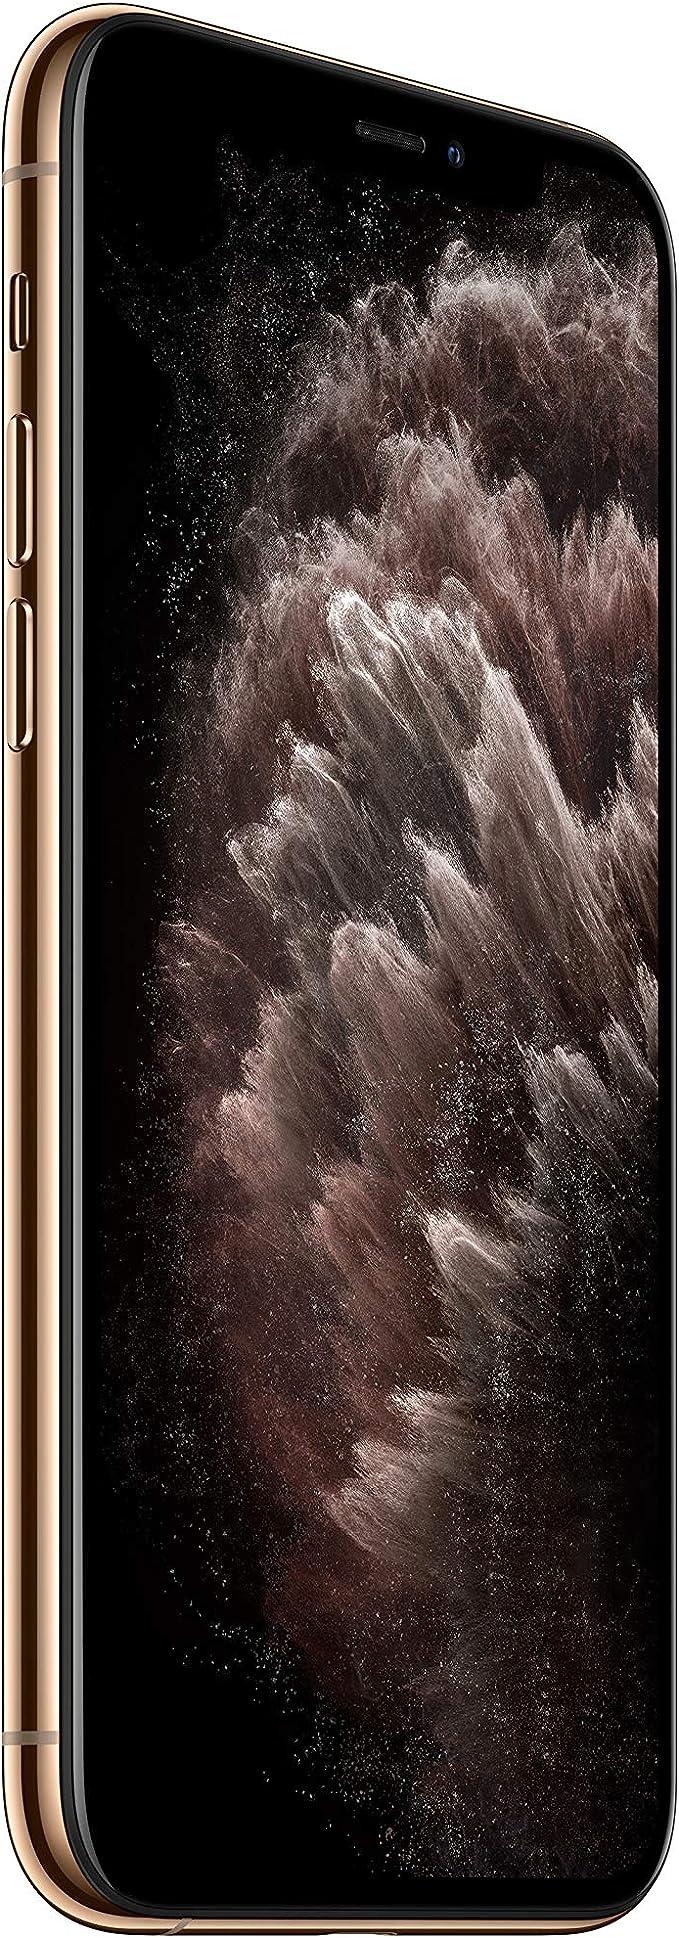 Apple iPhone 11 Pro (64 GB) - Oro: Amazon.es